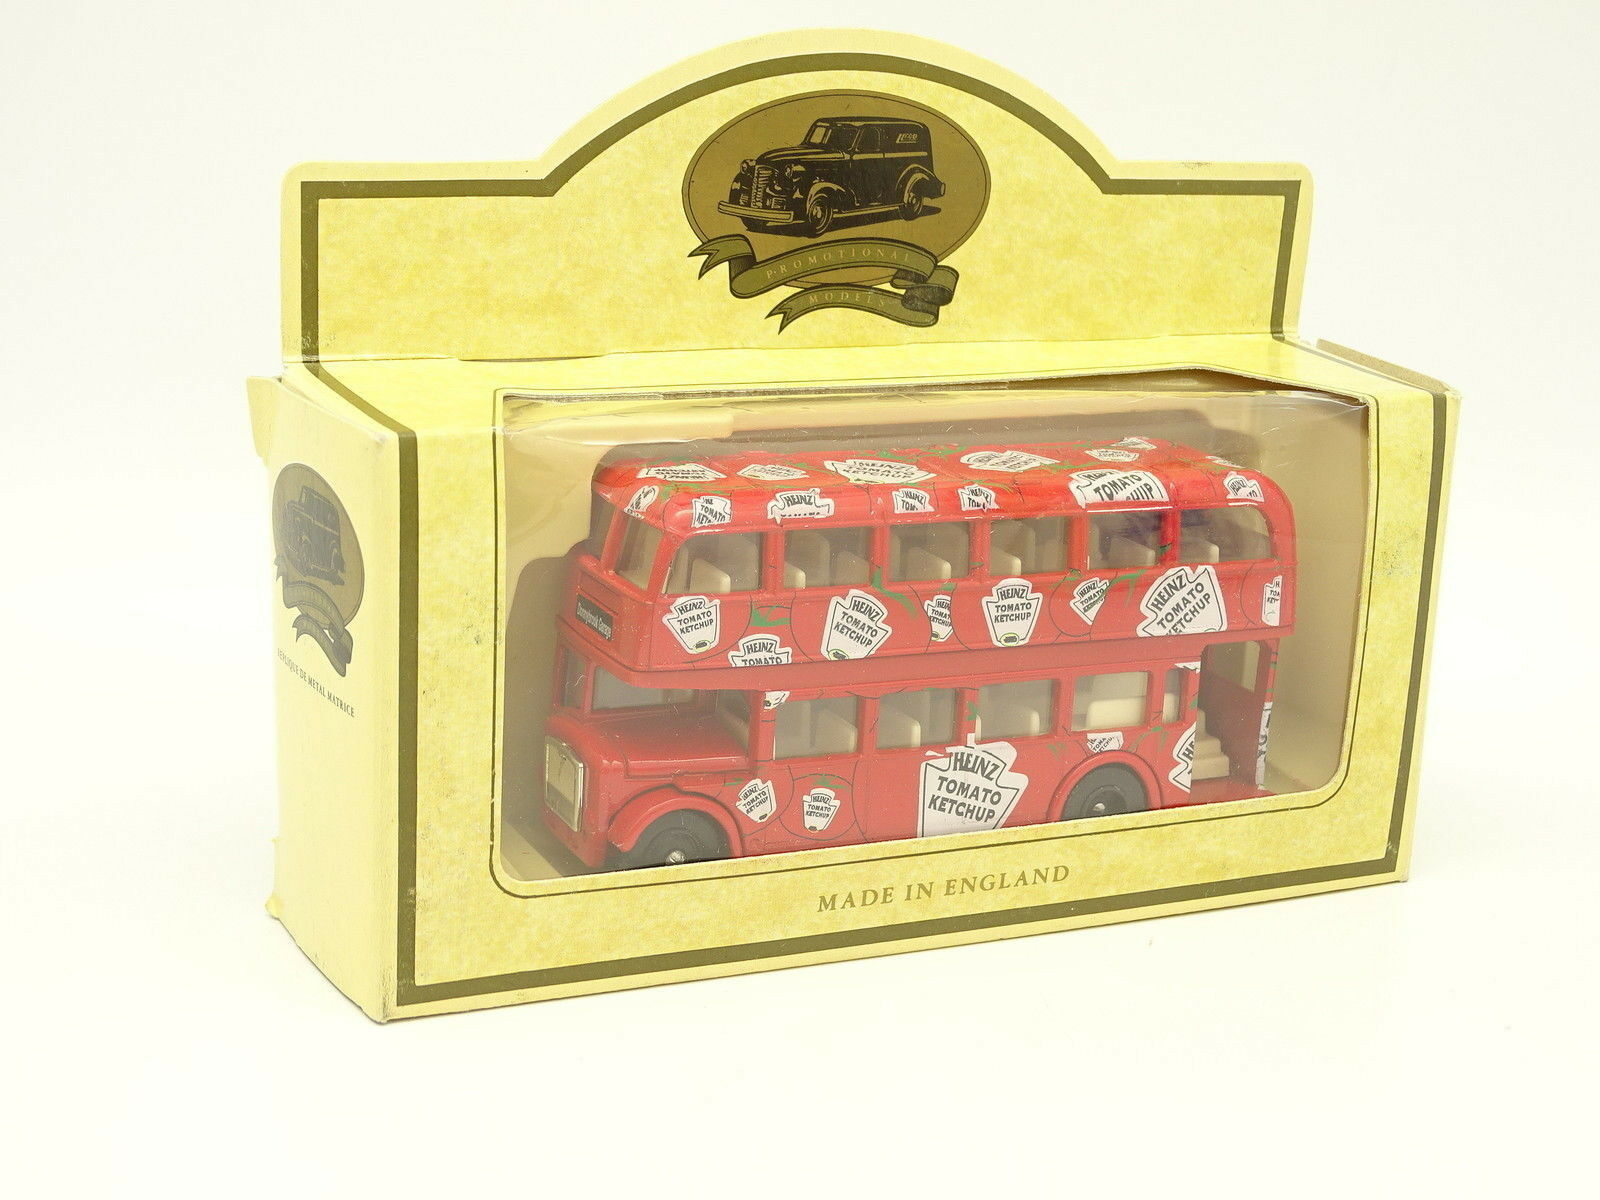 Days Gone 1 76 - Bus Autobus London Bus Heinz Ketchup